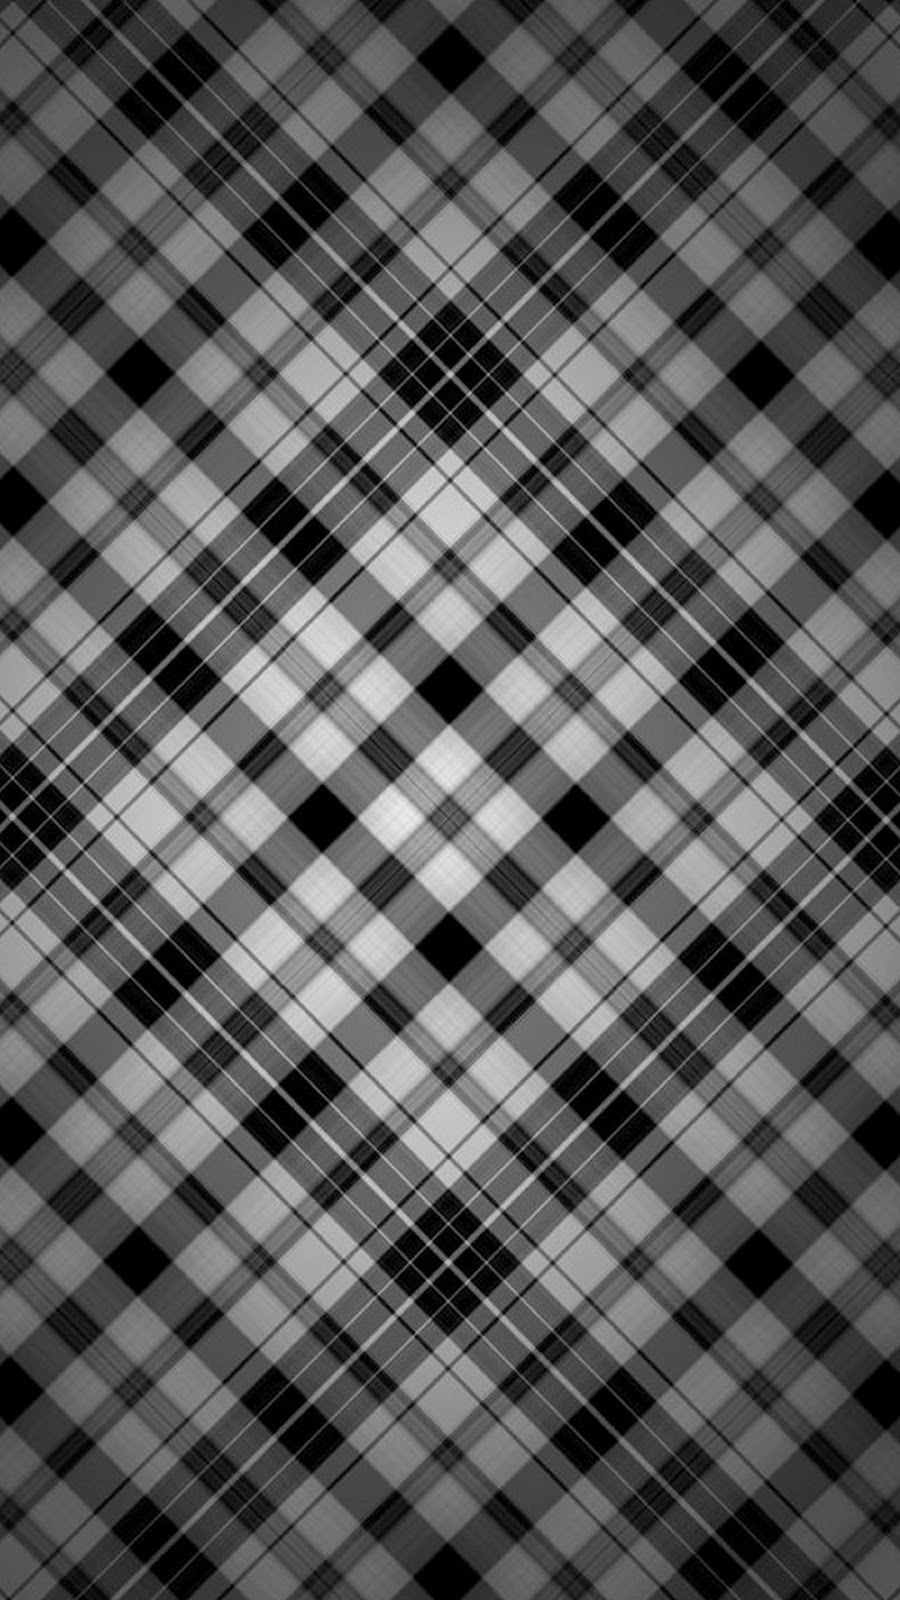 wallpapers wallpapers samsung galaxy s5 wallpaper pattern black plaid 900x1600